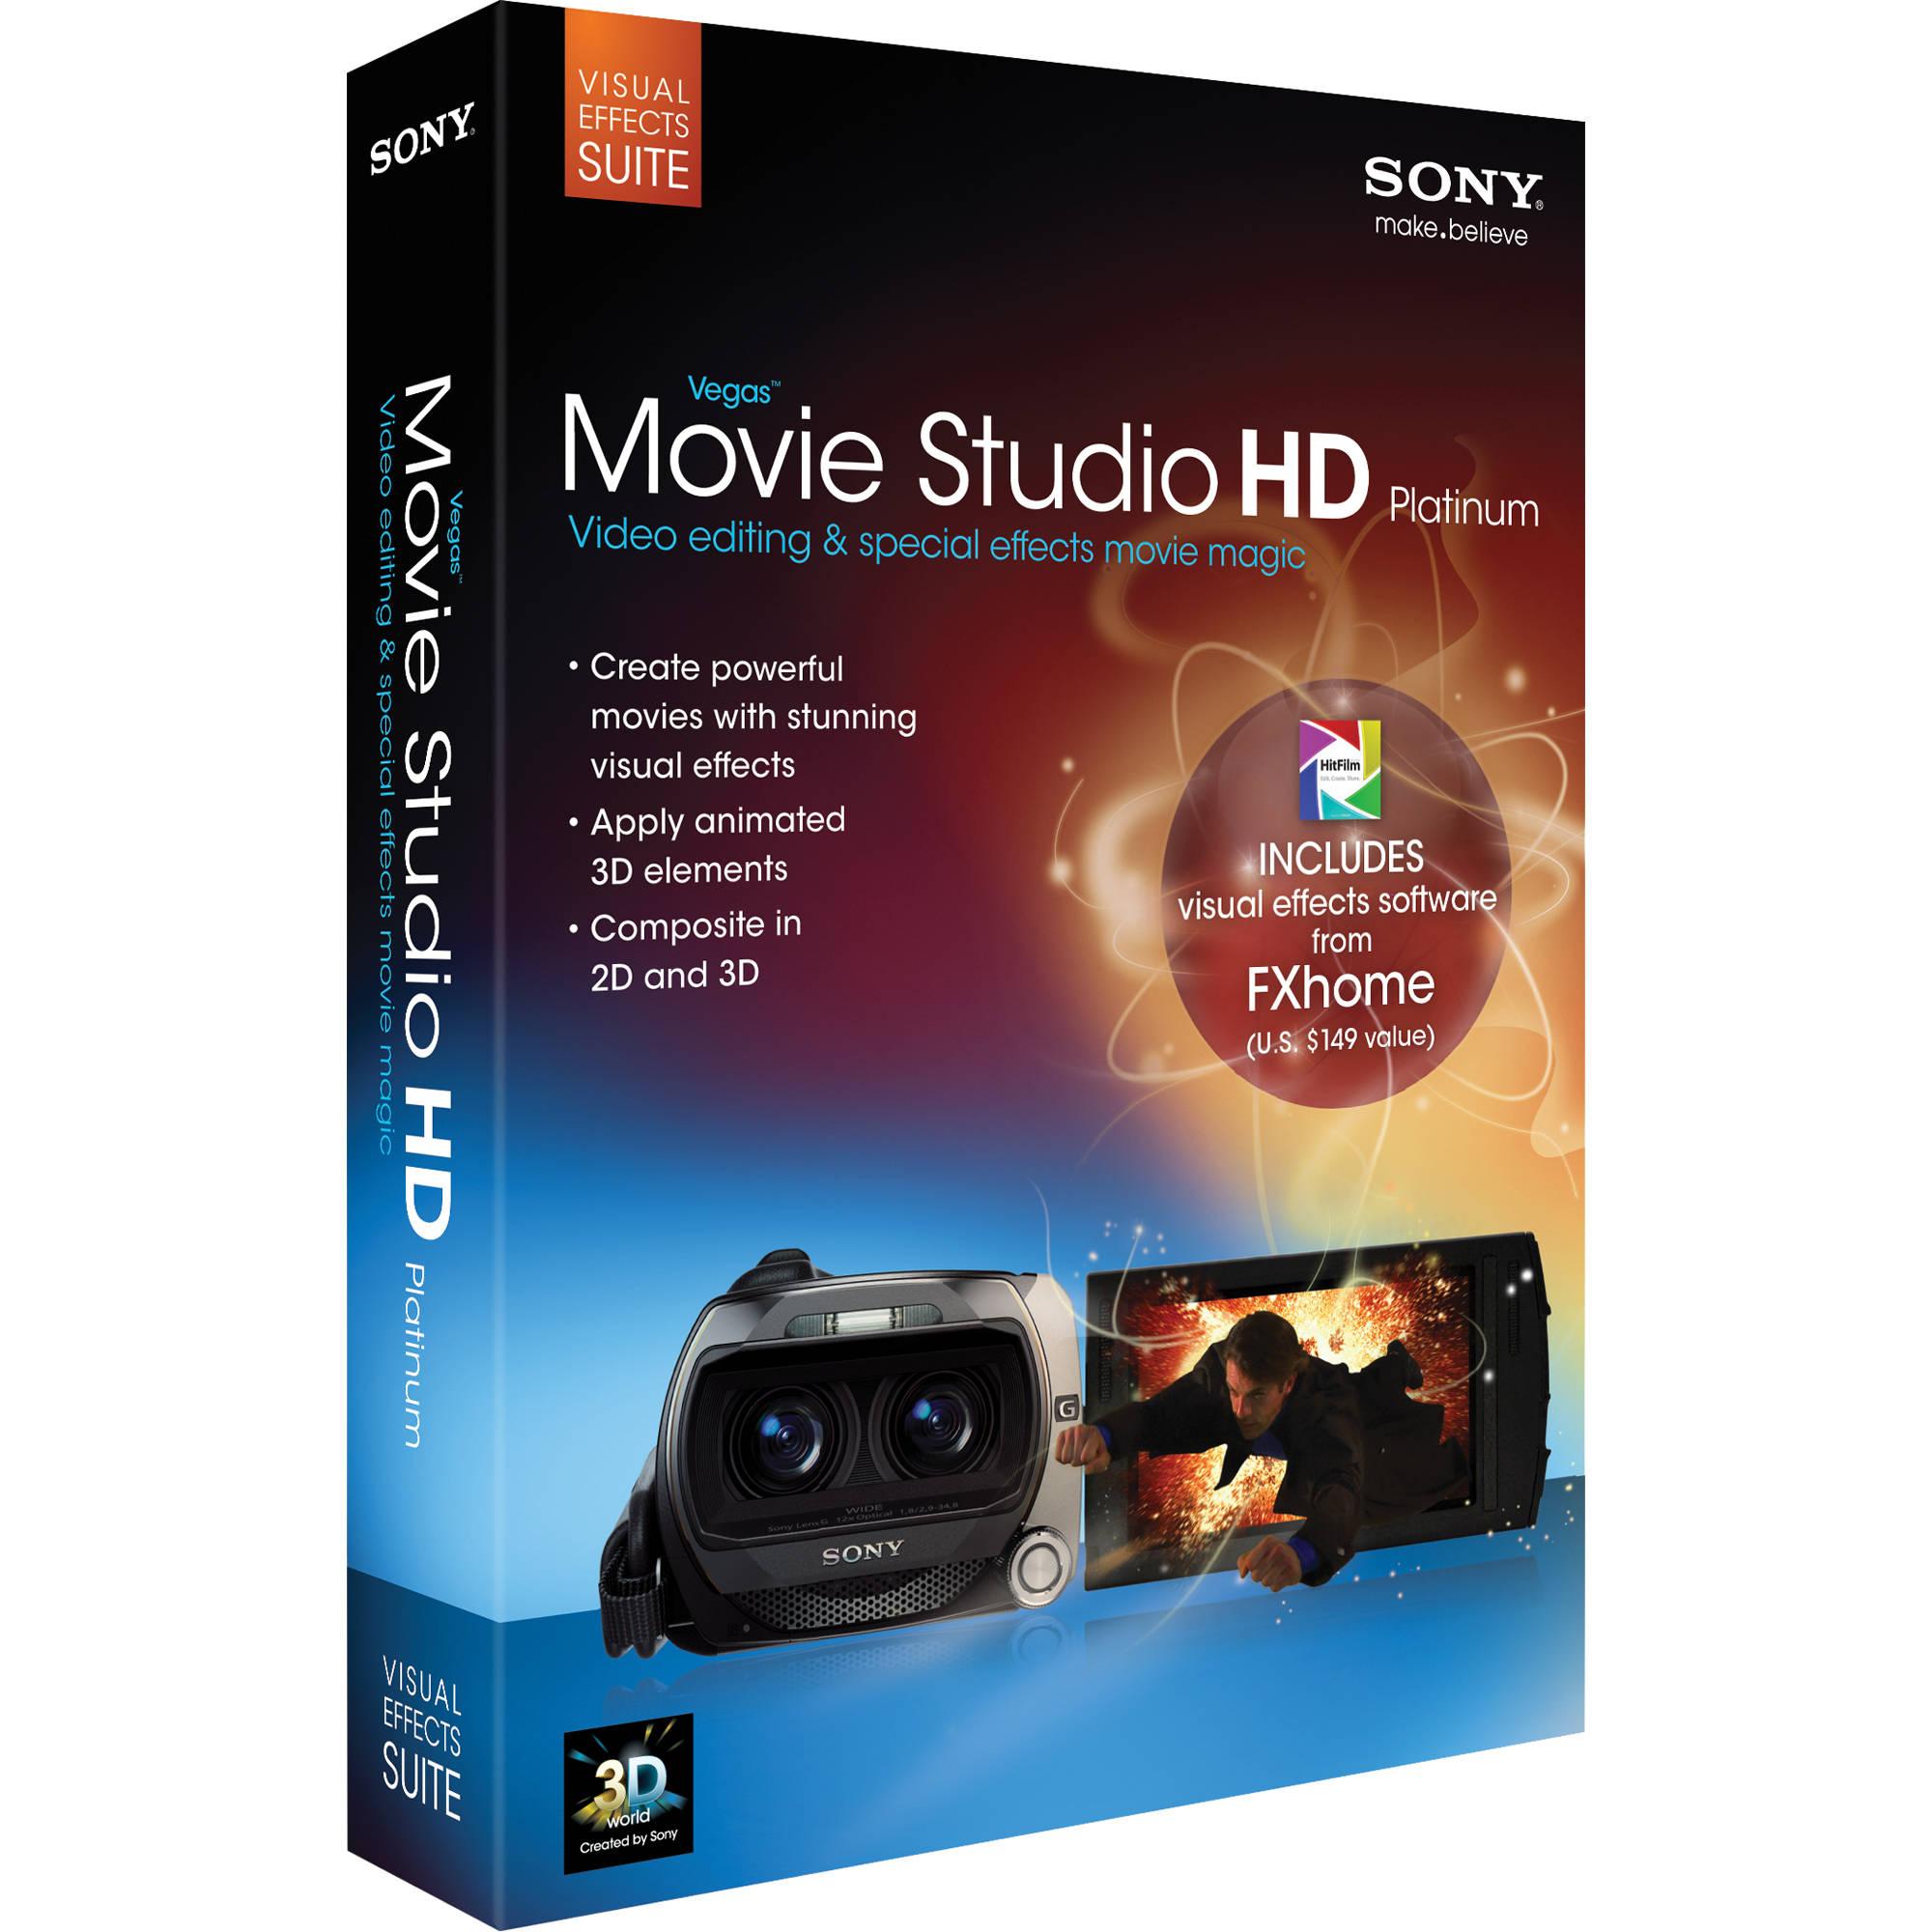 Sony Vegas Movie Studio HD Platinum Visual Effects Suite